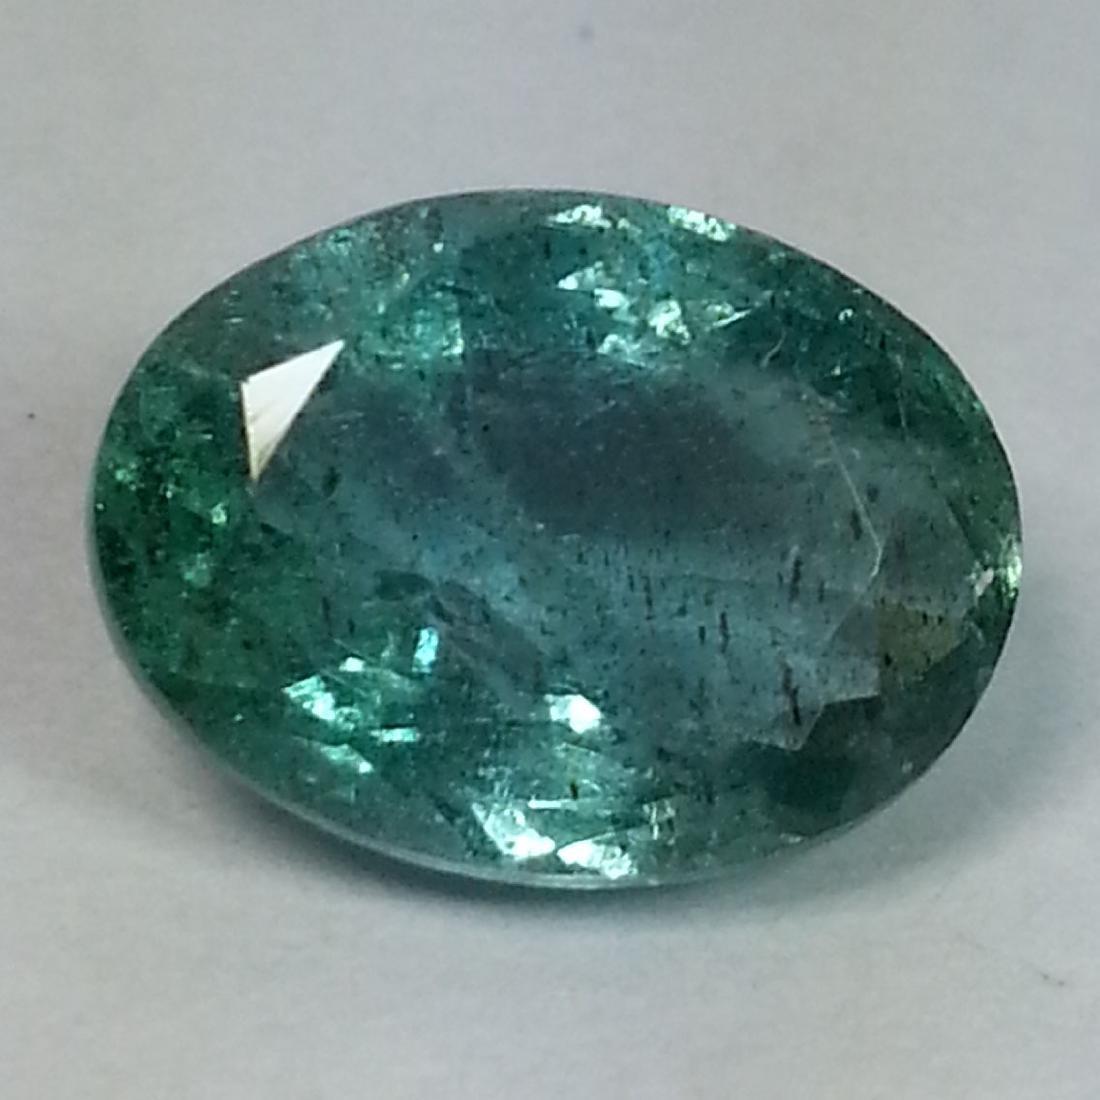 Emerald - 3.08 ct - 2